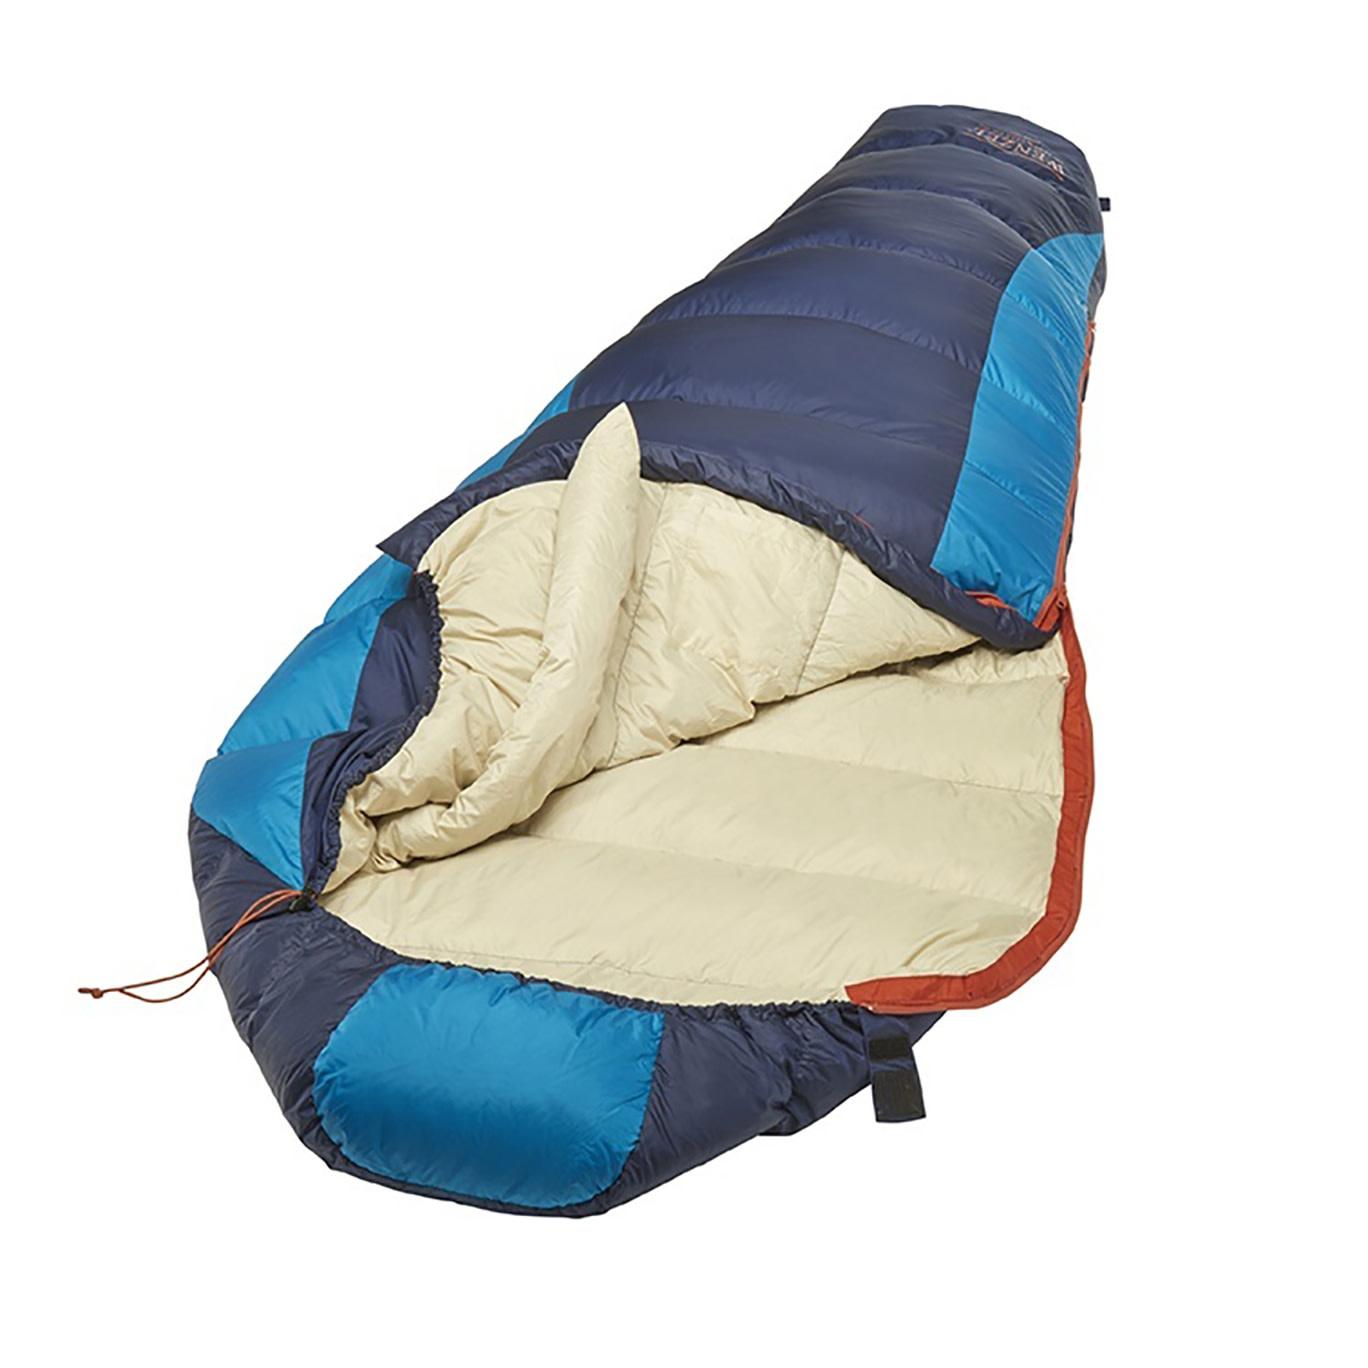 Jailbird Down Sleeping Bag 30 - 40 degree, Mummy-3